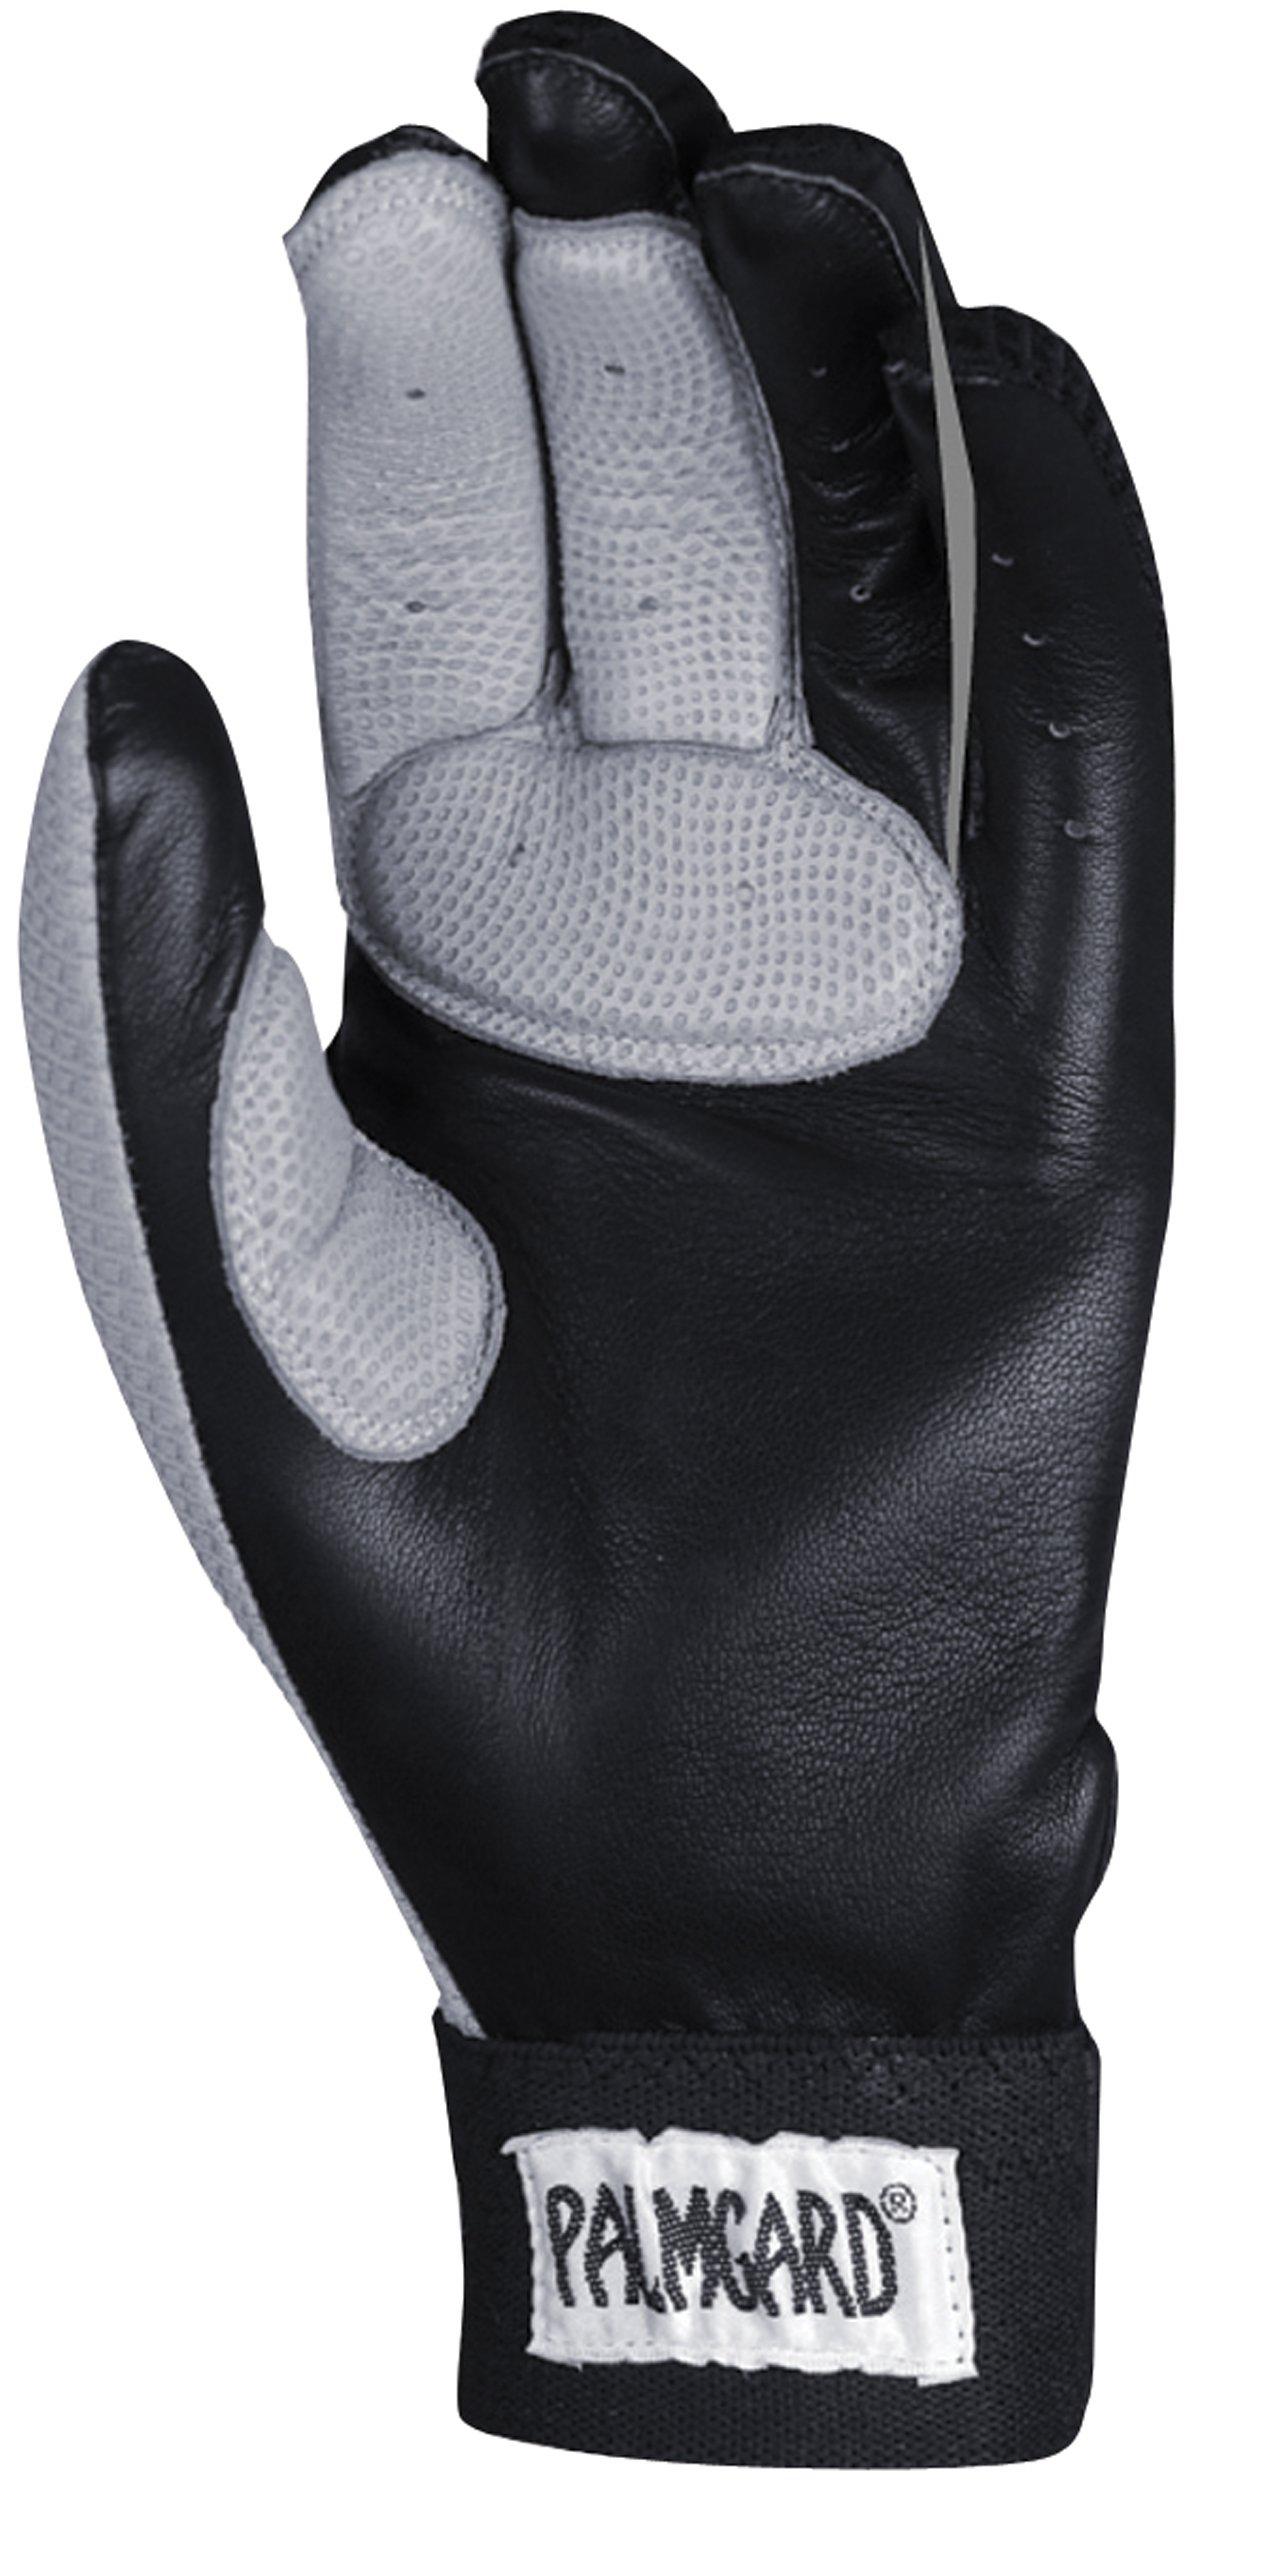 Markwort Palmgard Xtra Inner Glove, Black, Left Hand, Youth, Large by Markwort